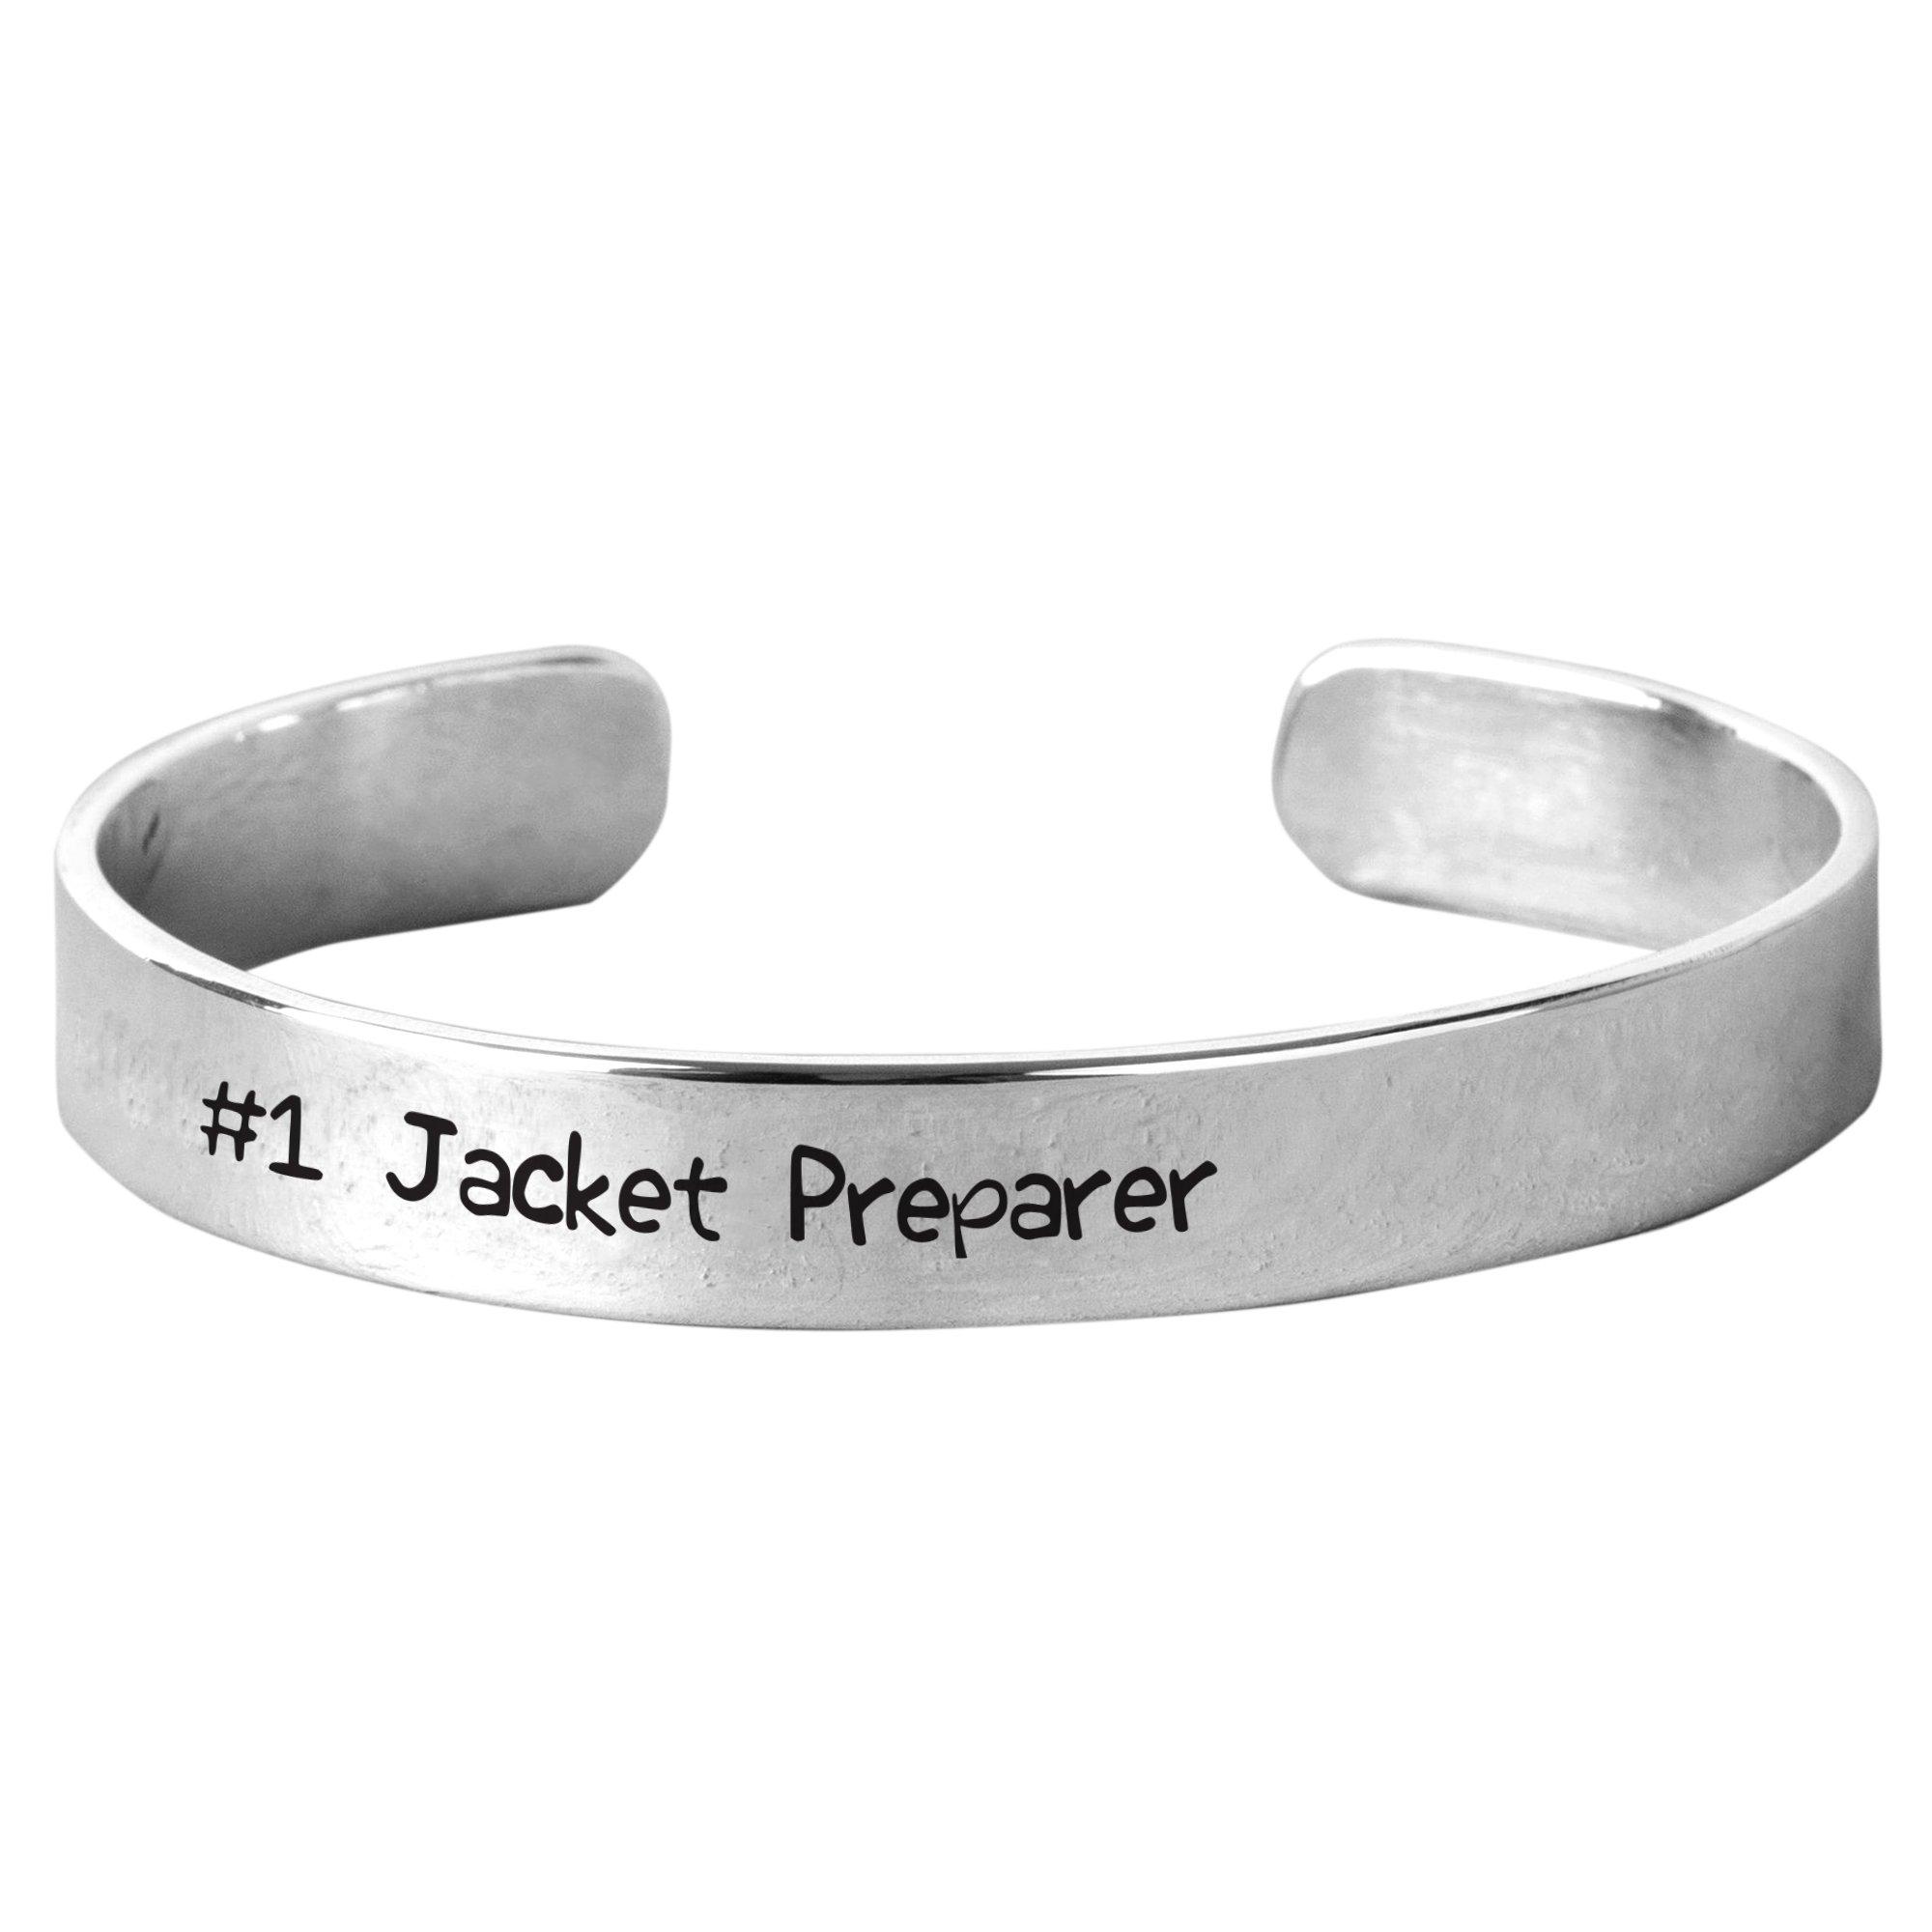 #1 Jacket Preparer - Unisex Hand-Stamped Aluminium Bracelet